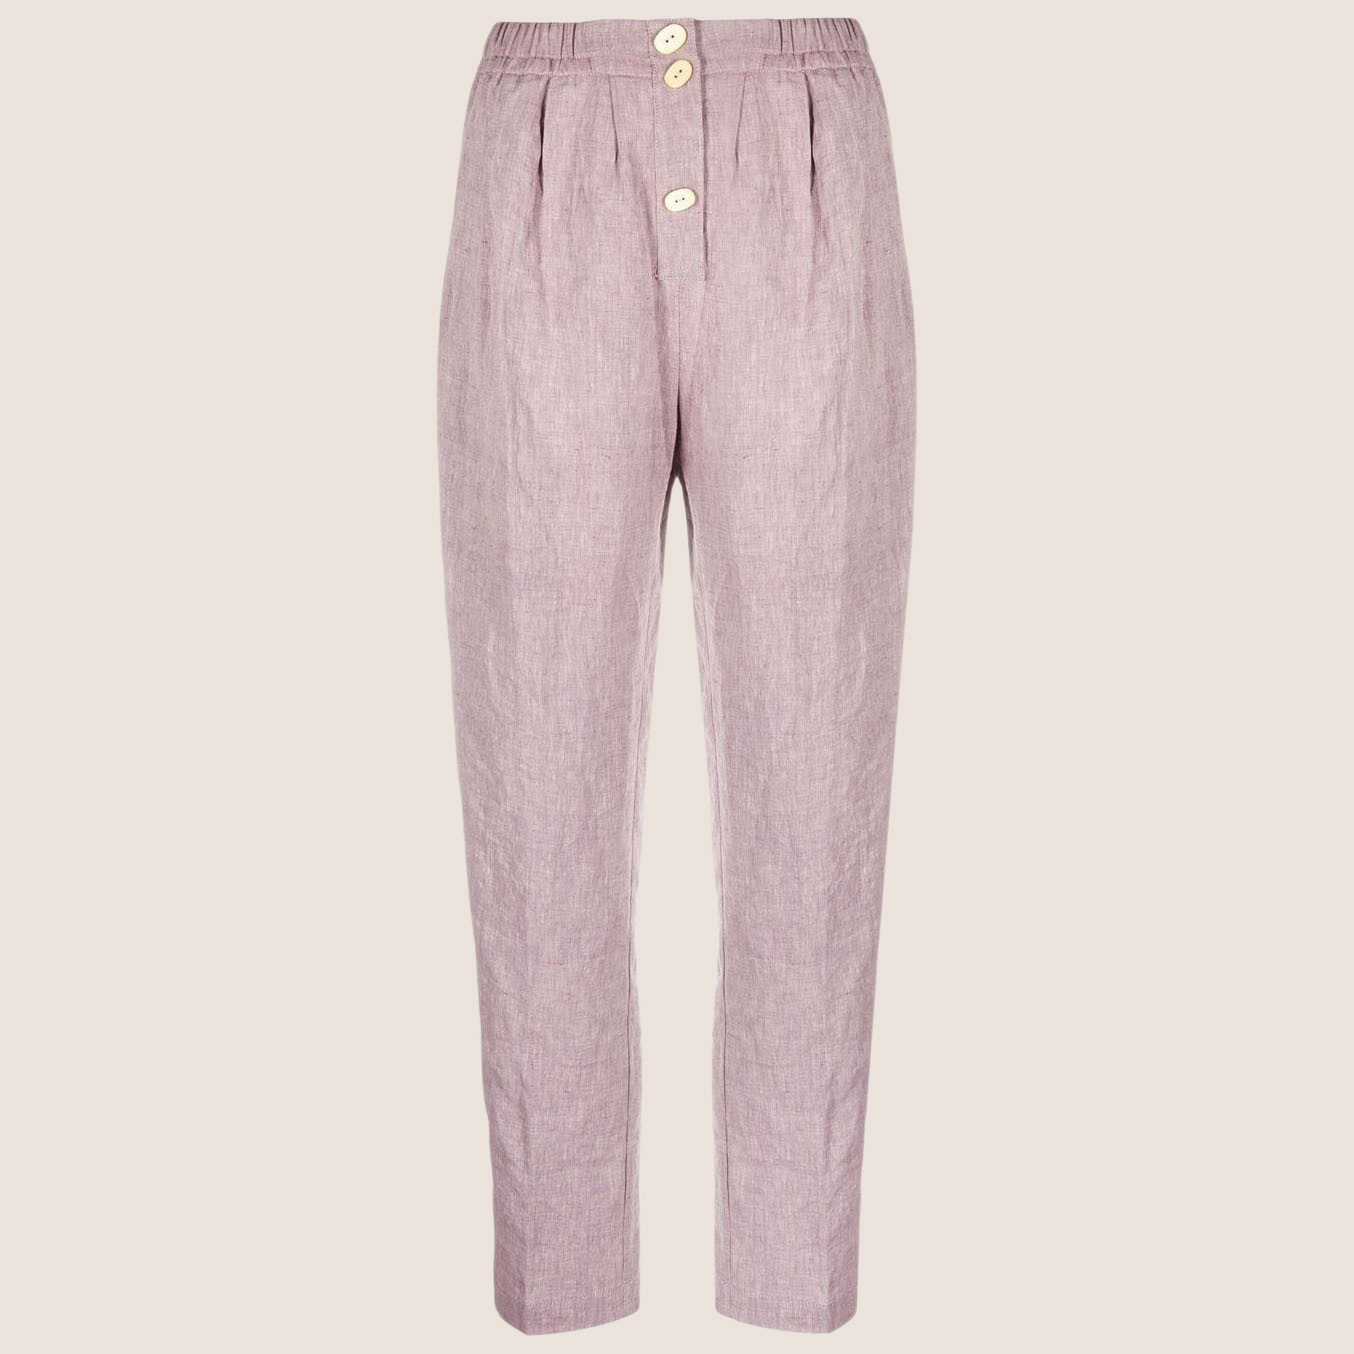 Elasricated Pants